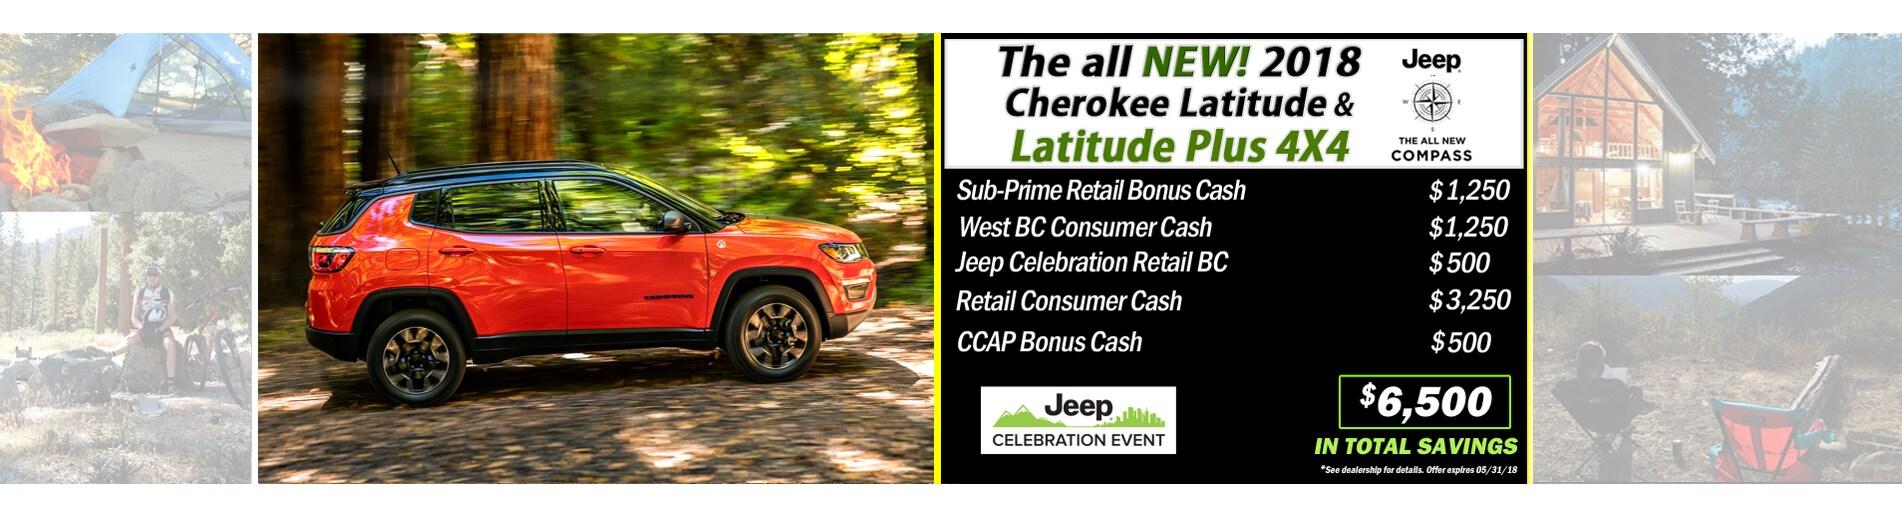 dealer temecula ca hemet new in dodge jeep vehicles certified ram and murrieta menifee chrysler